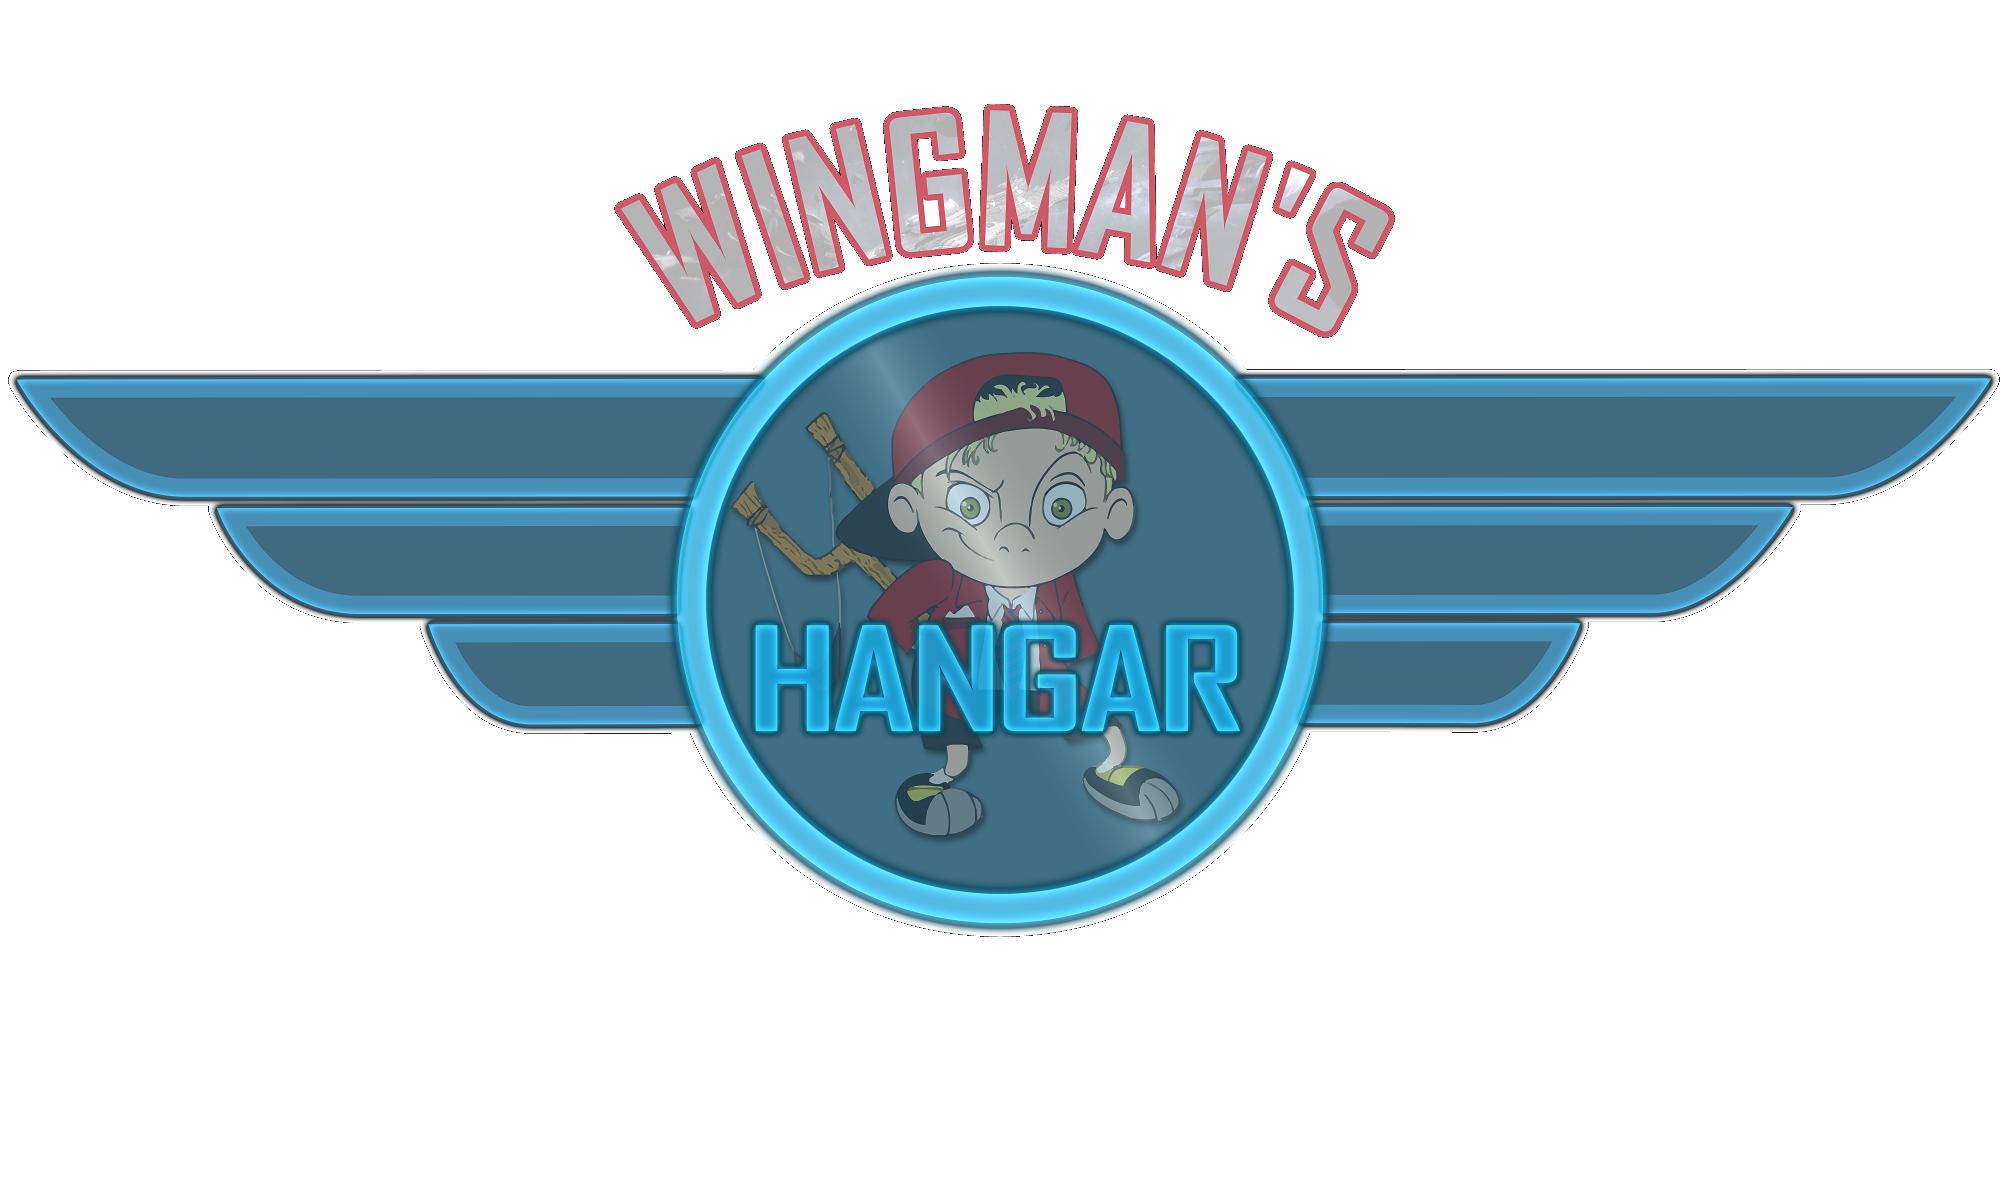 46Wingman_hangar_high_res